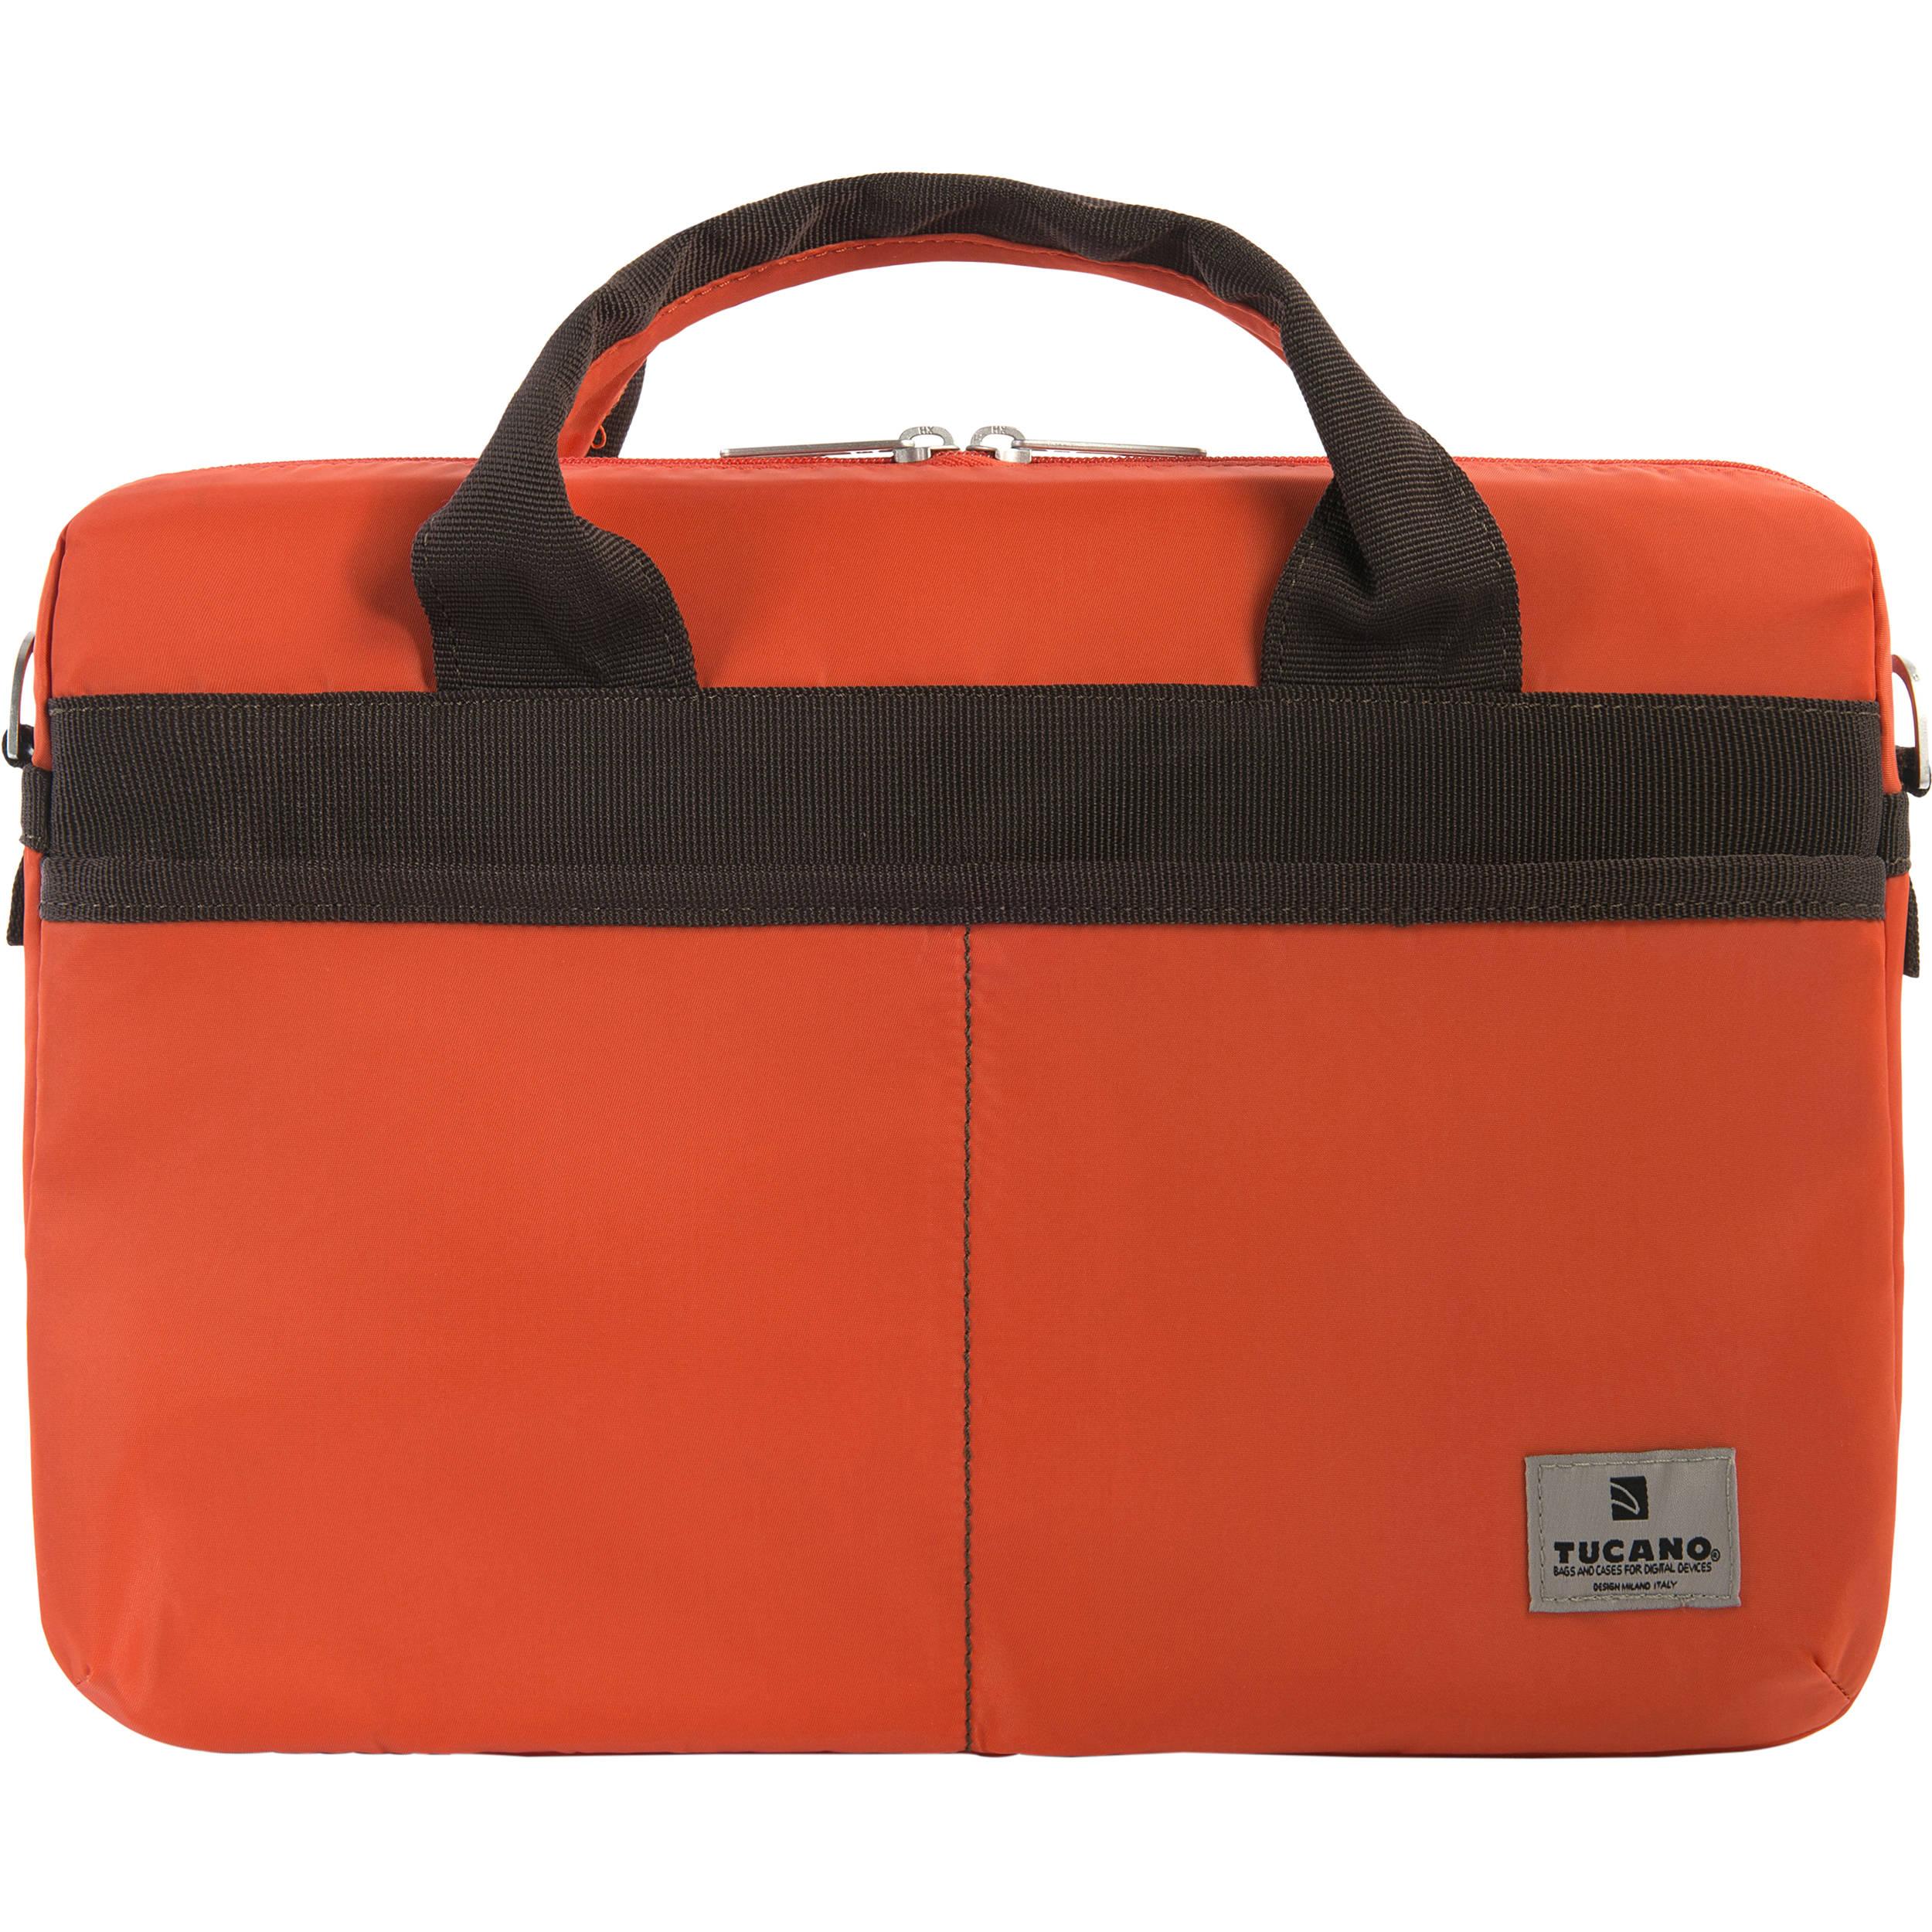 Tucano Shine Slim 13 Bag For Macbook Pro Or Notebook Orange